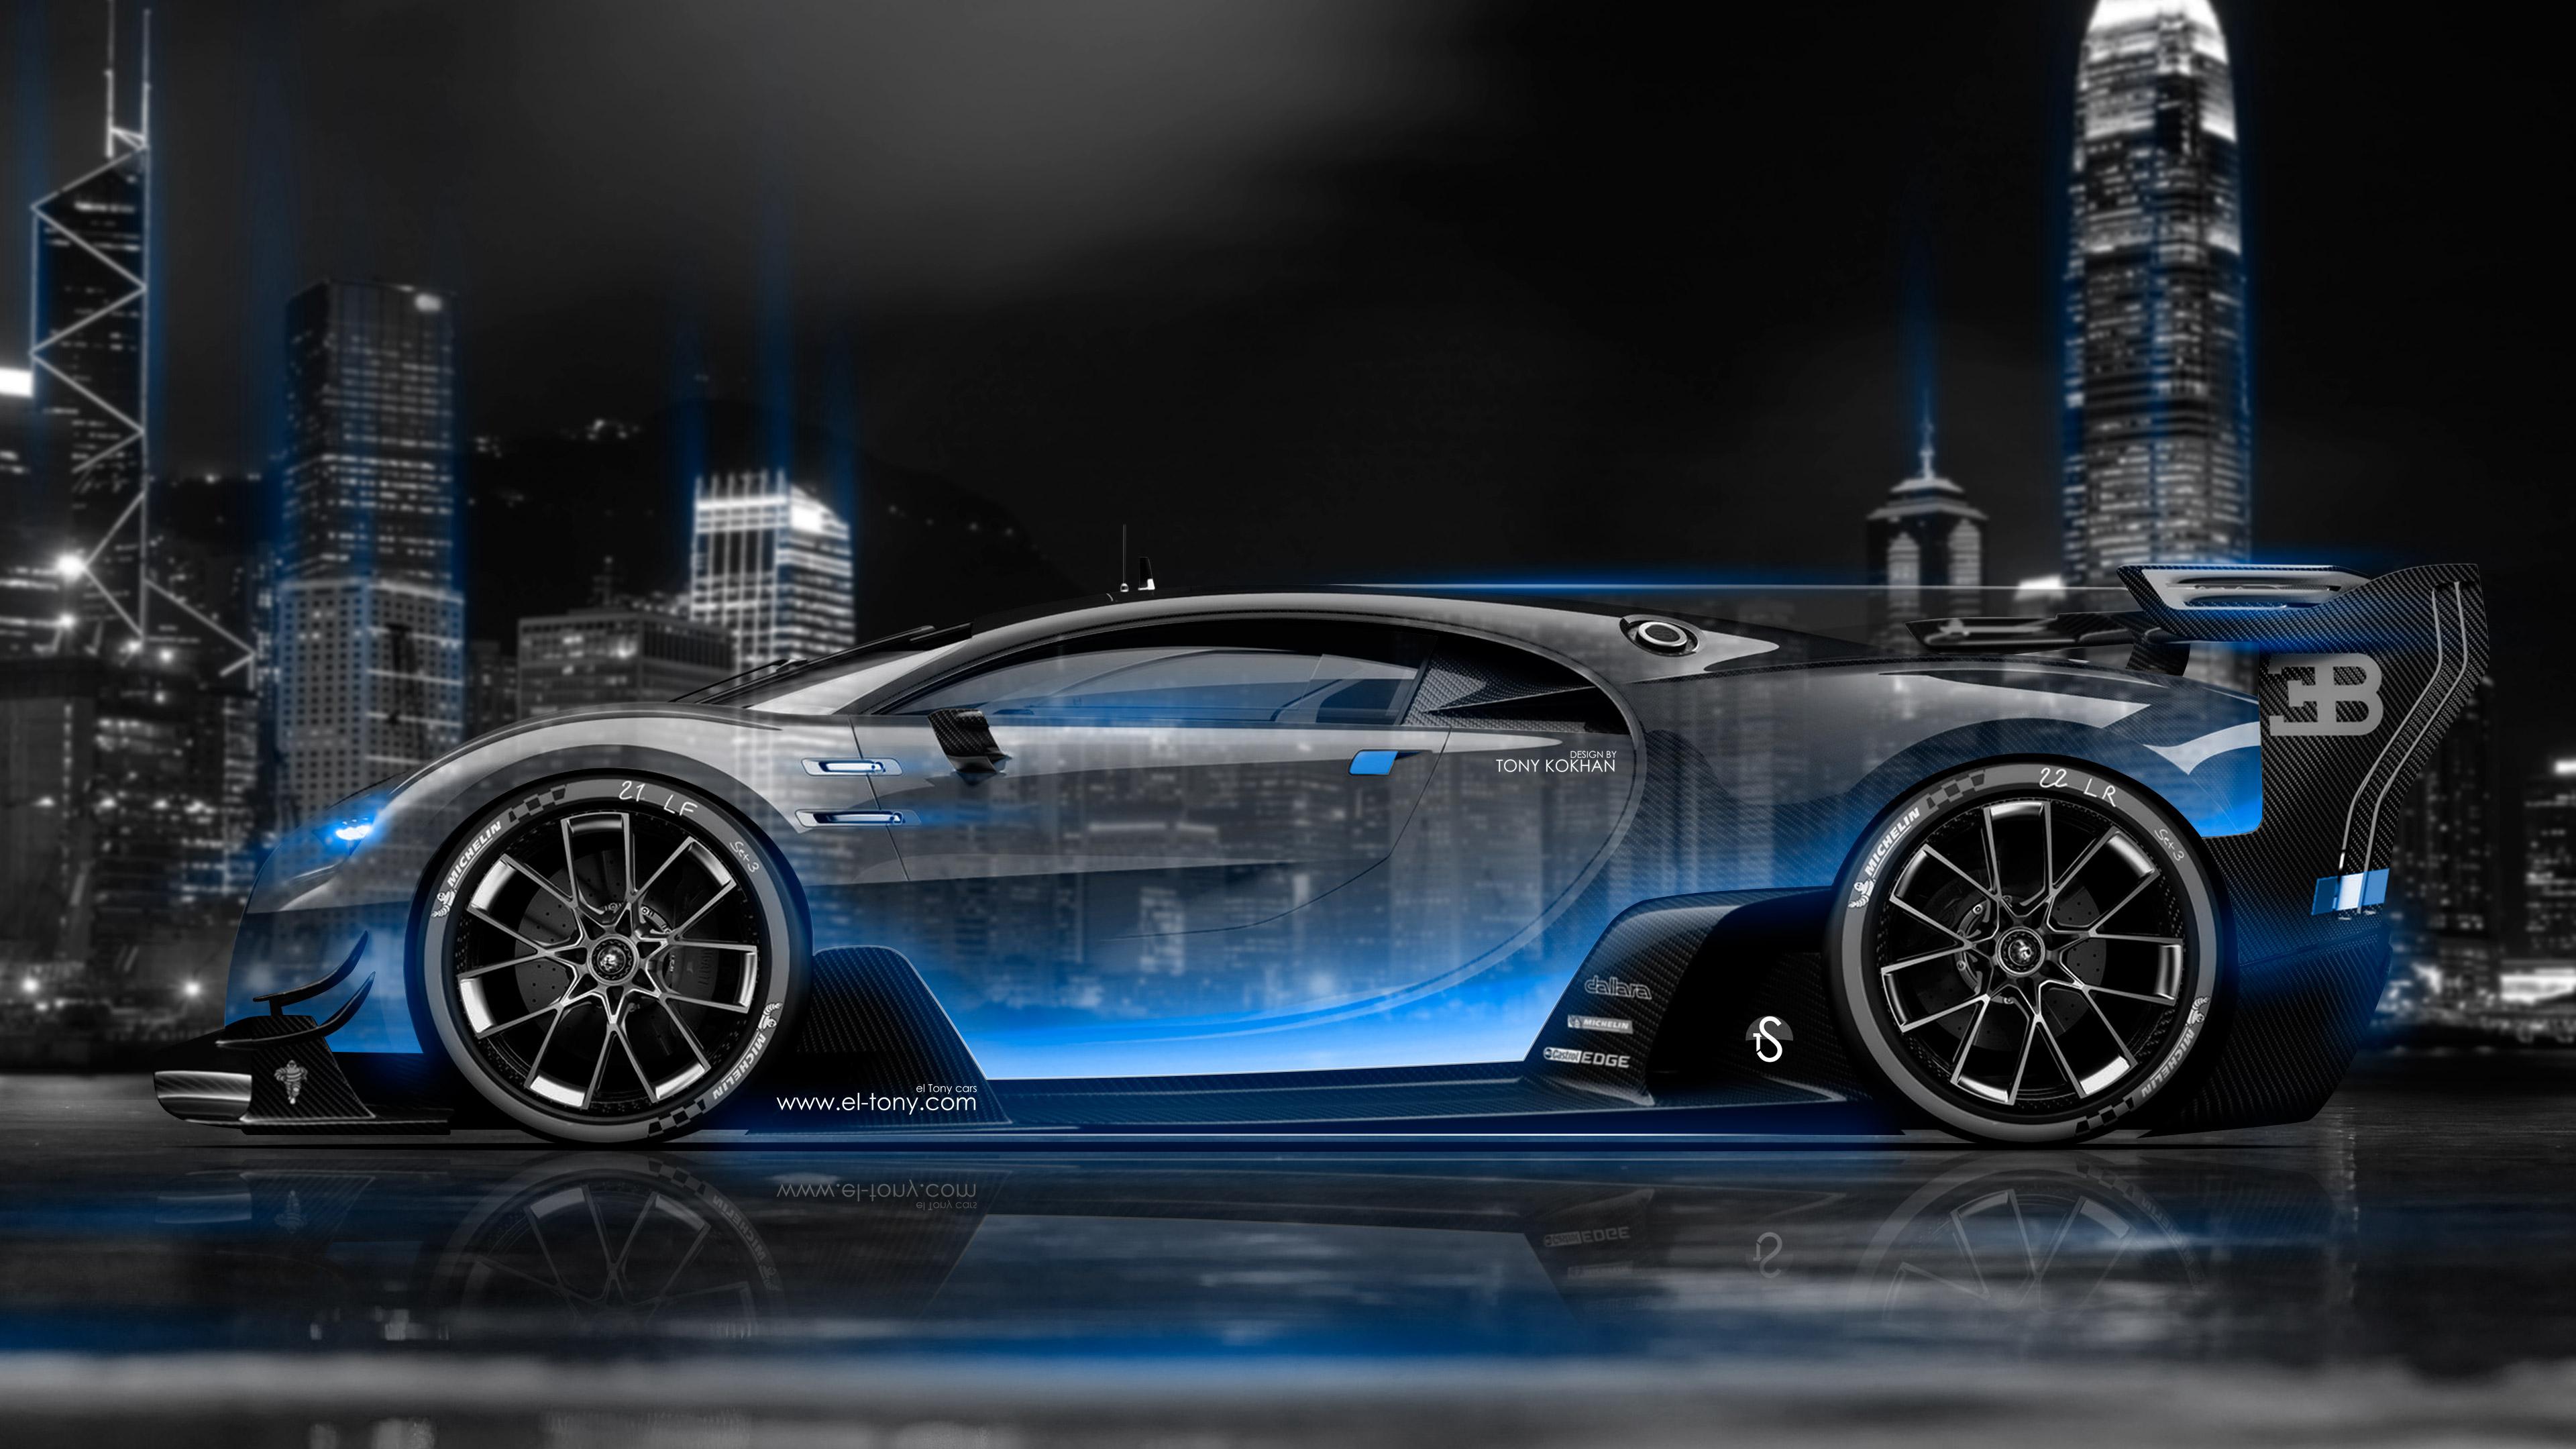 Wallpaper 4k Bugatti Vision Gran Turismo Side Crystal City Night Car